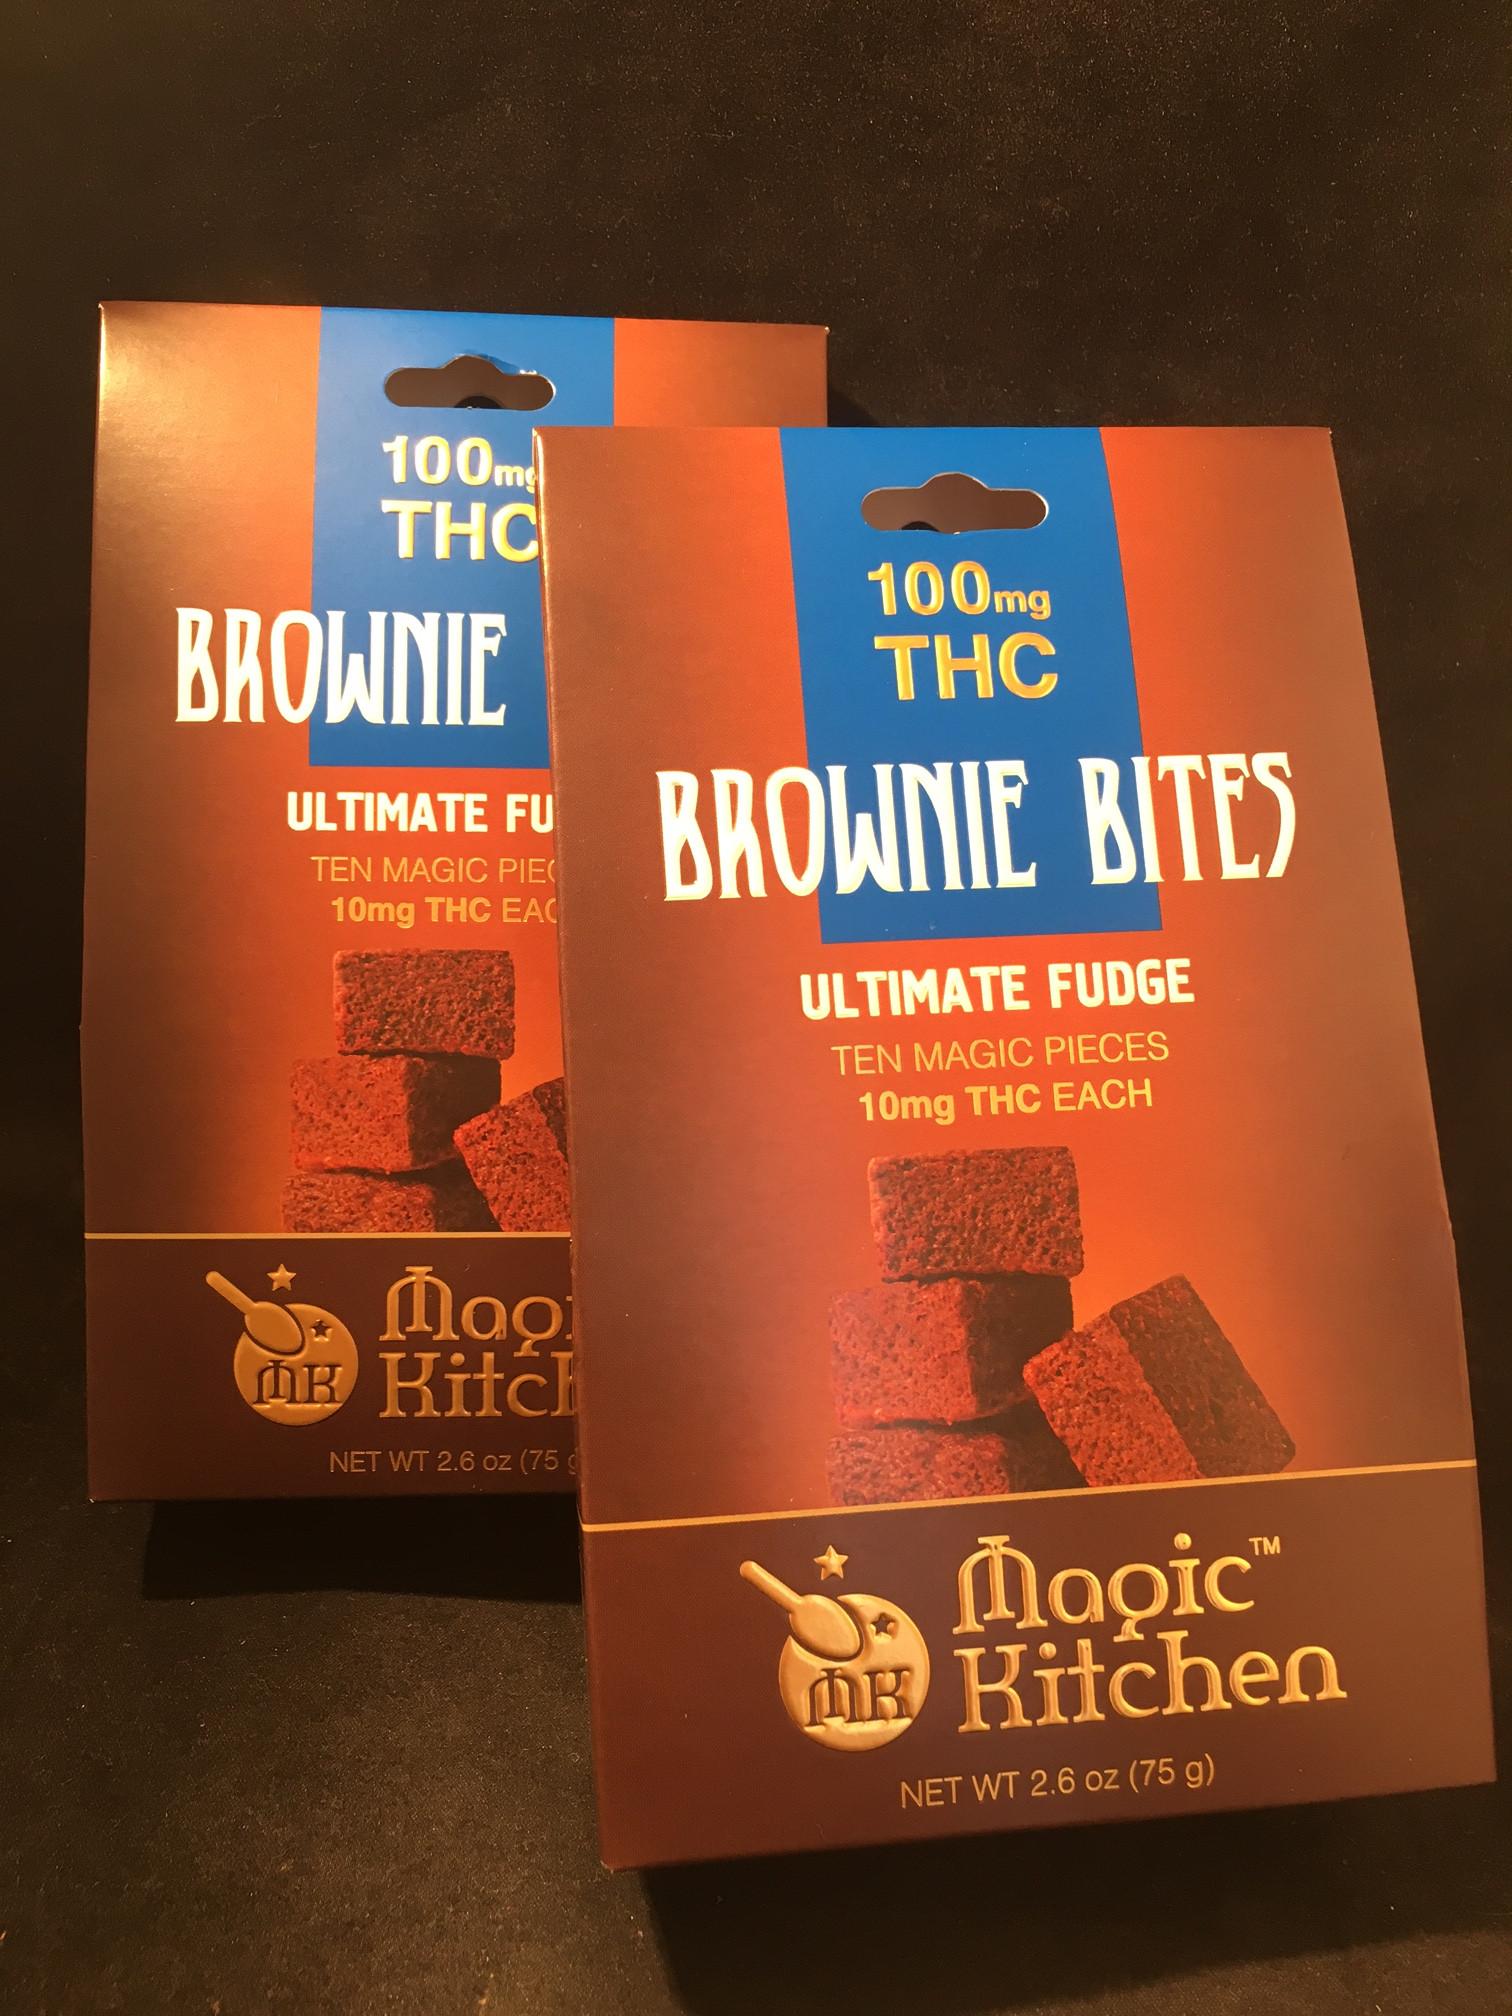 Magic Kitchen Ultimate Fudge Brown